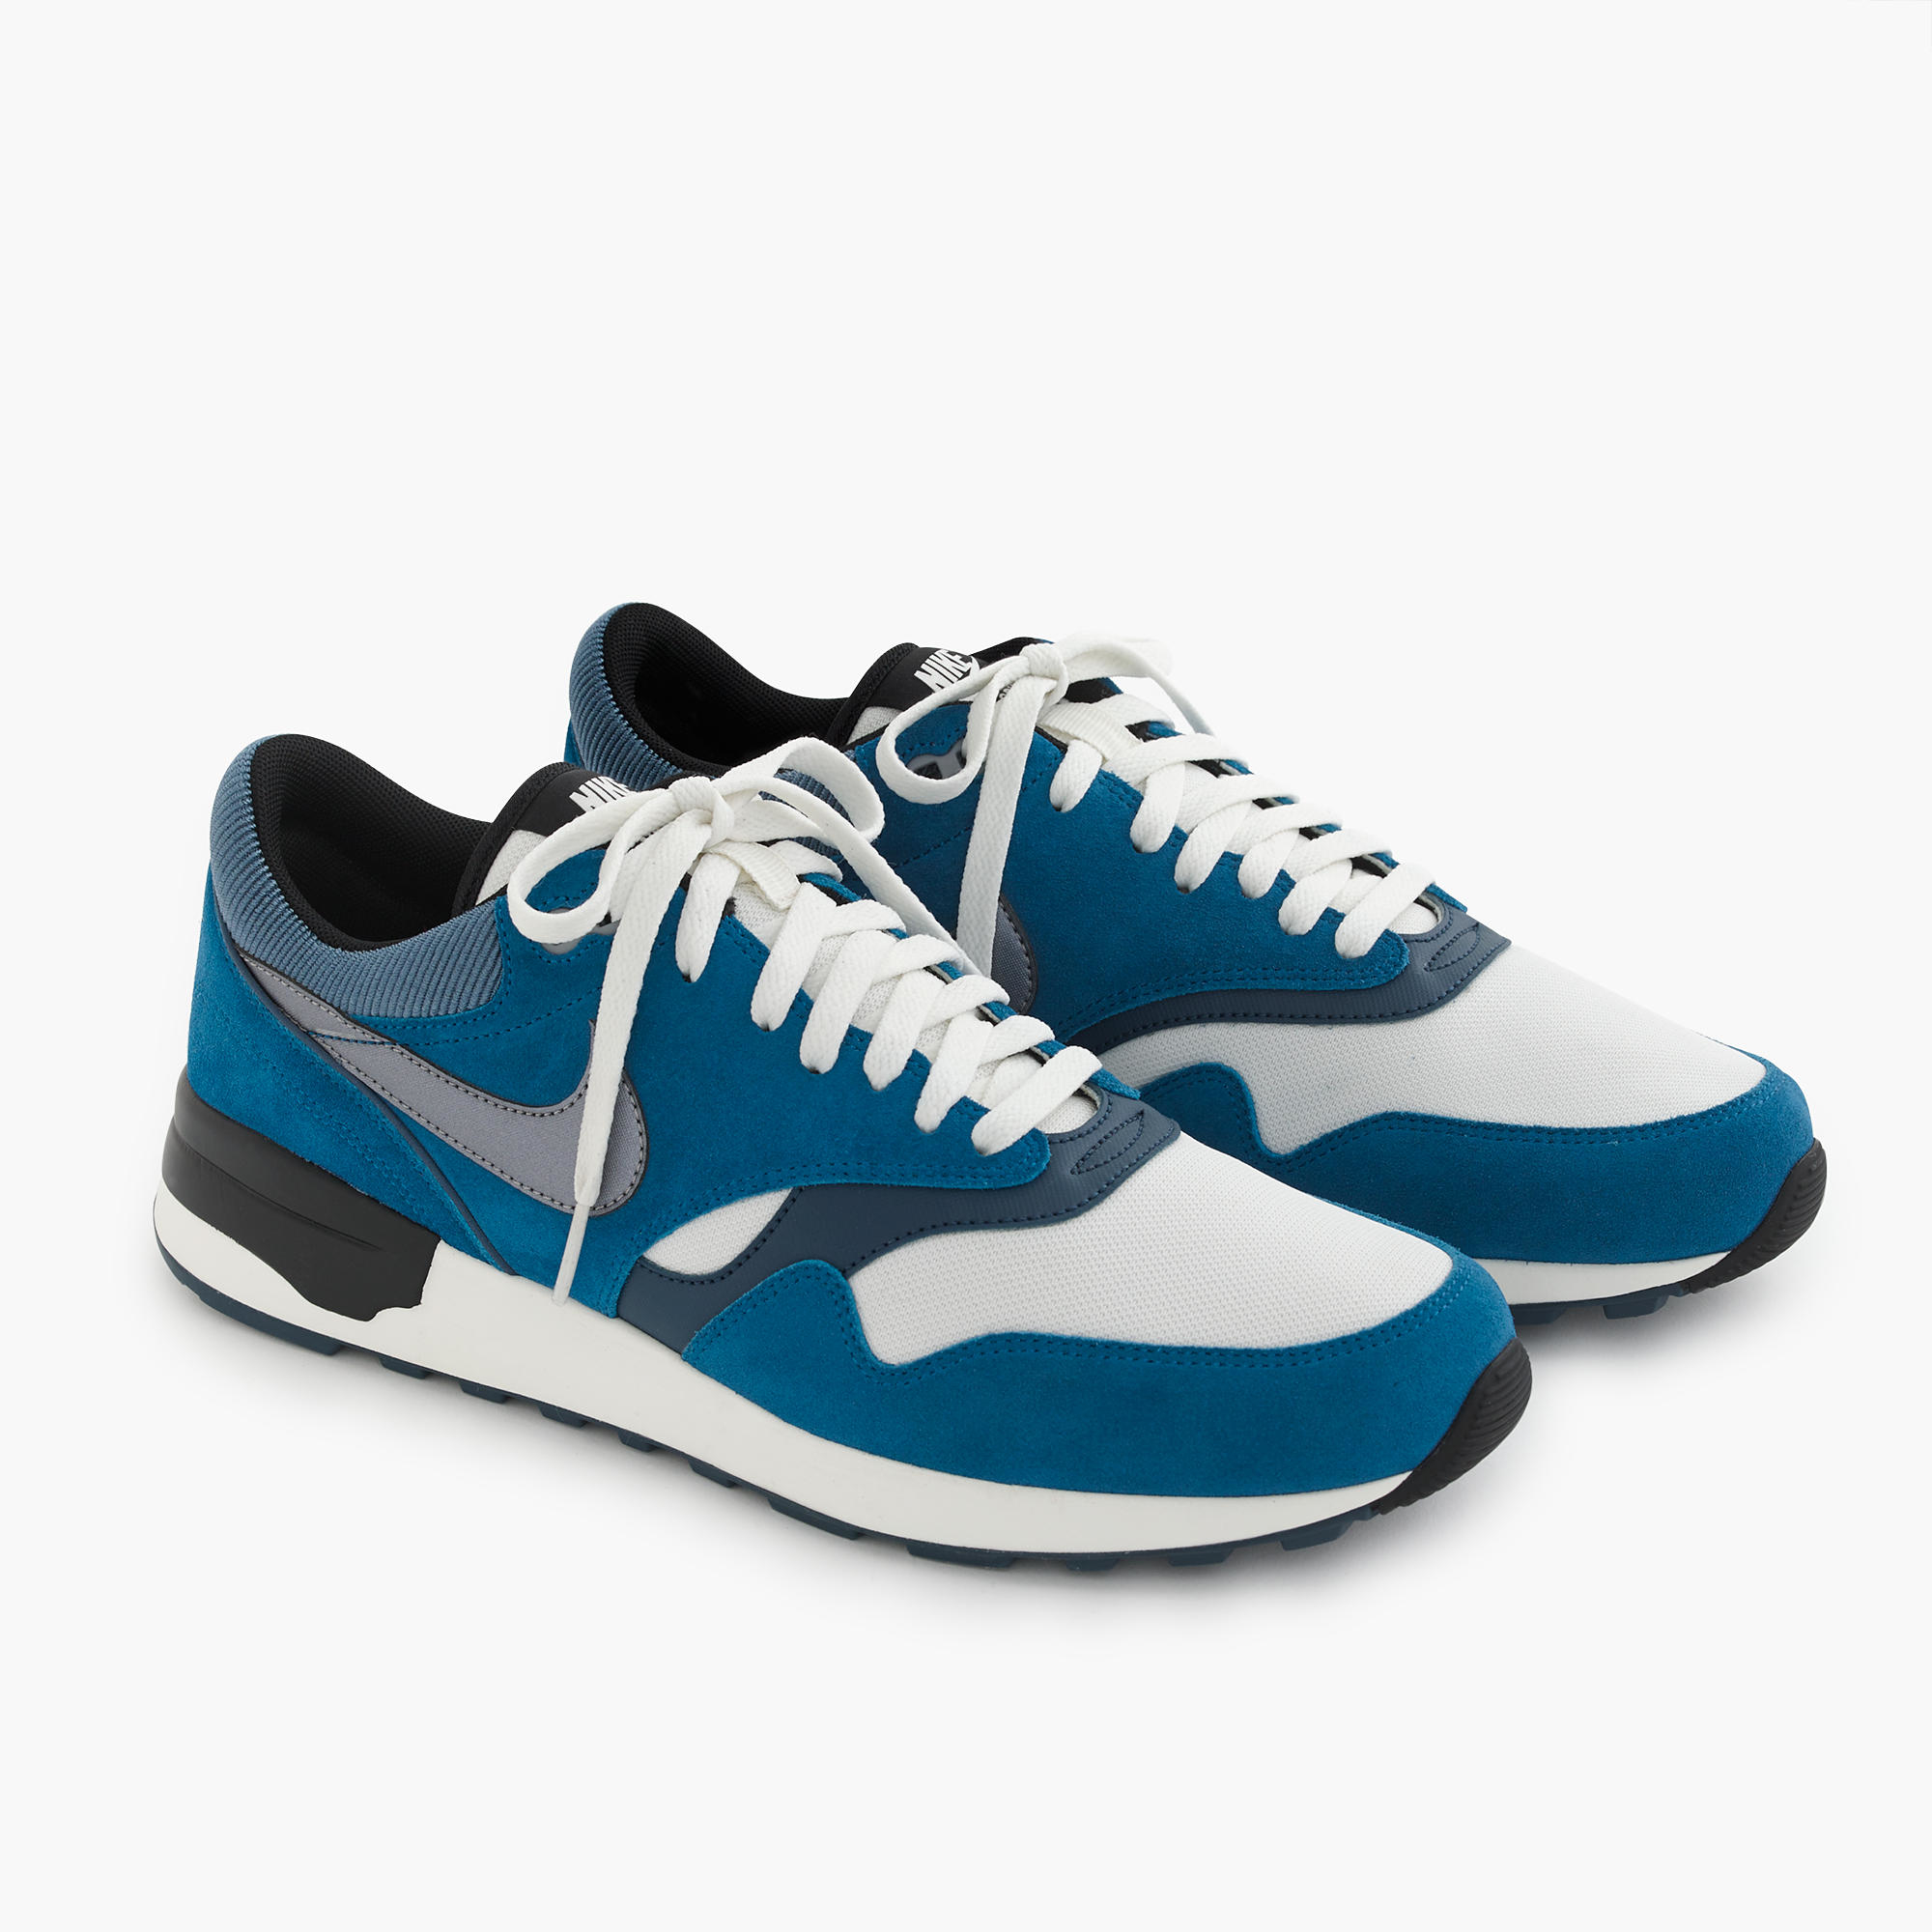 nike air odyssey sneakers in cobalt in blue for men. Black Bedroom Furniture Sets. Home Design Ideas